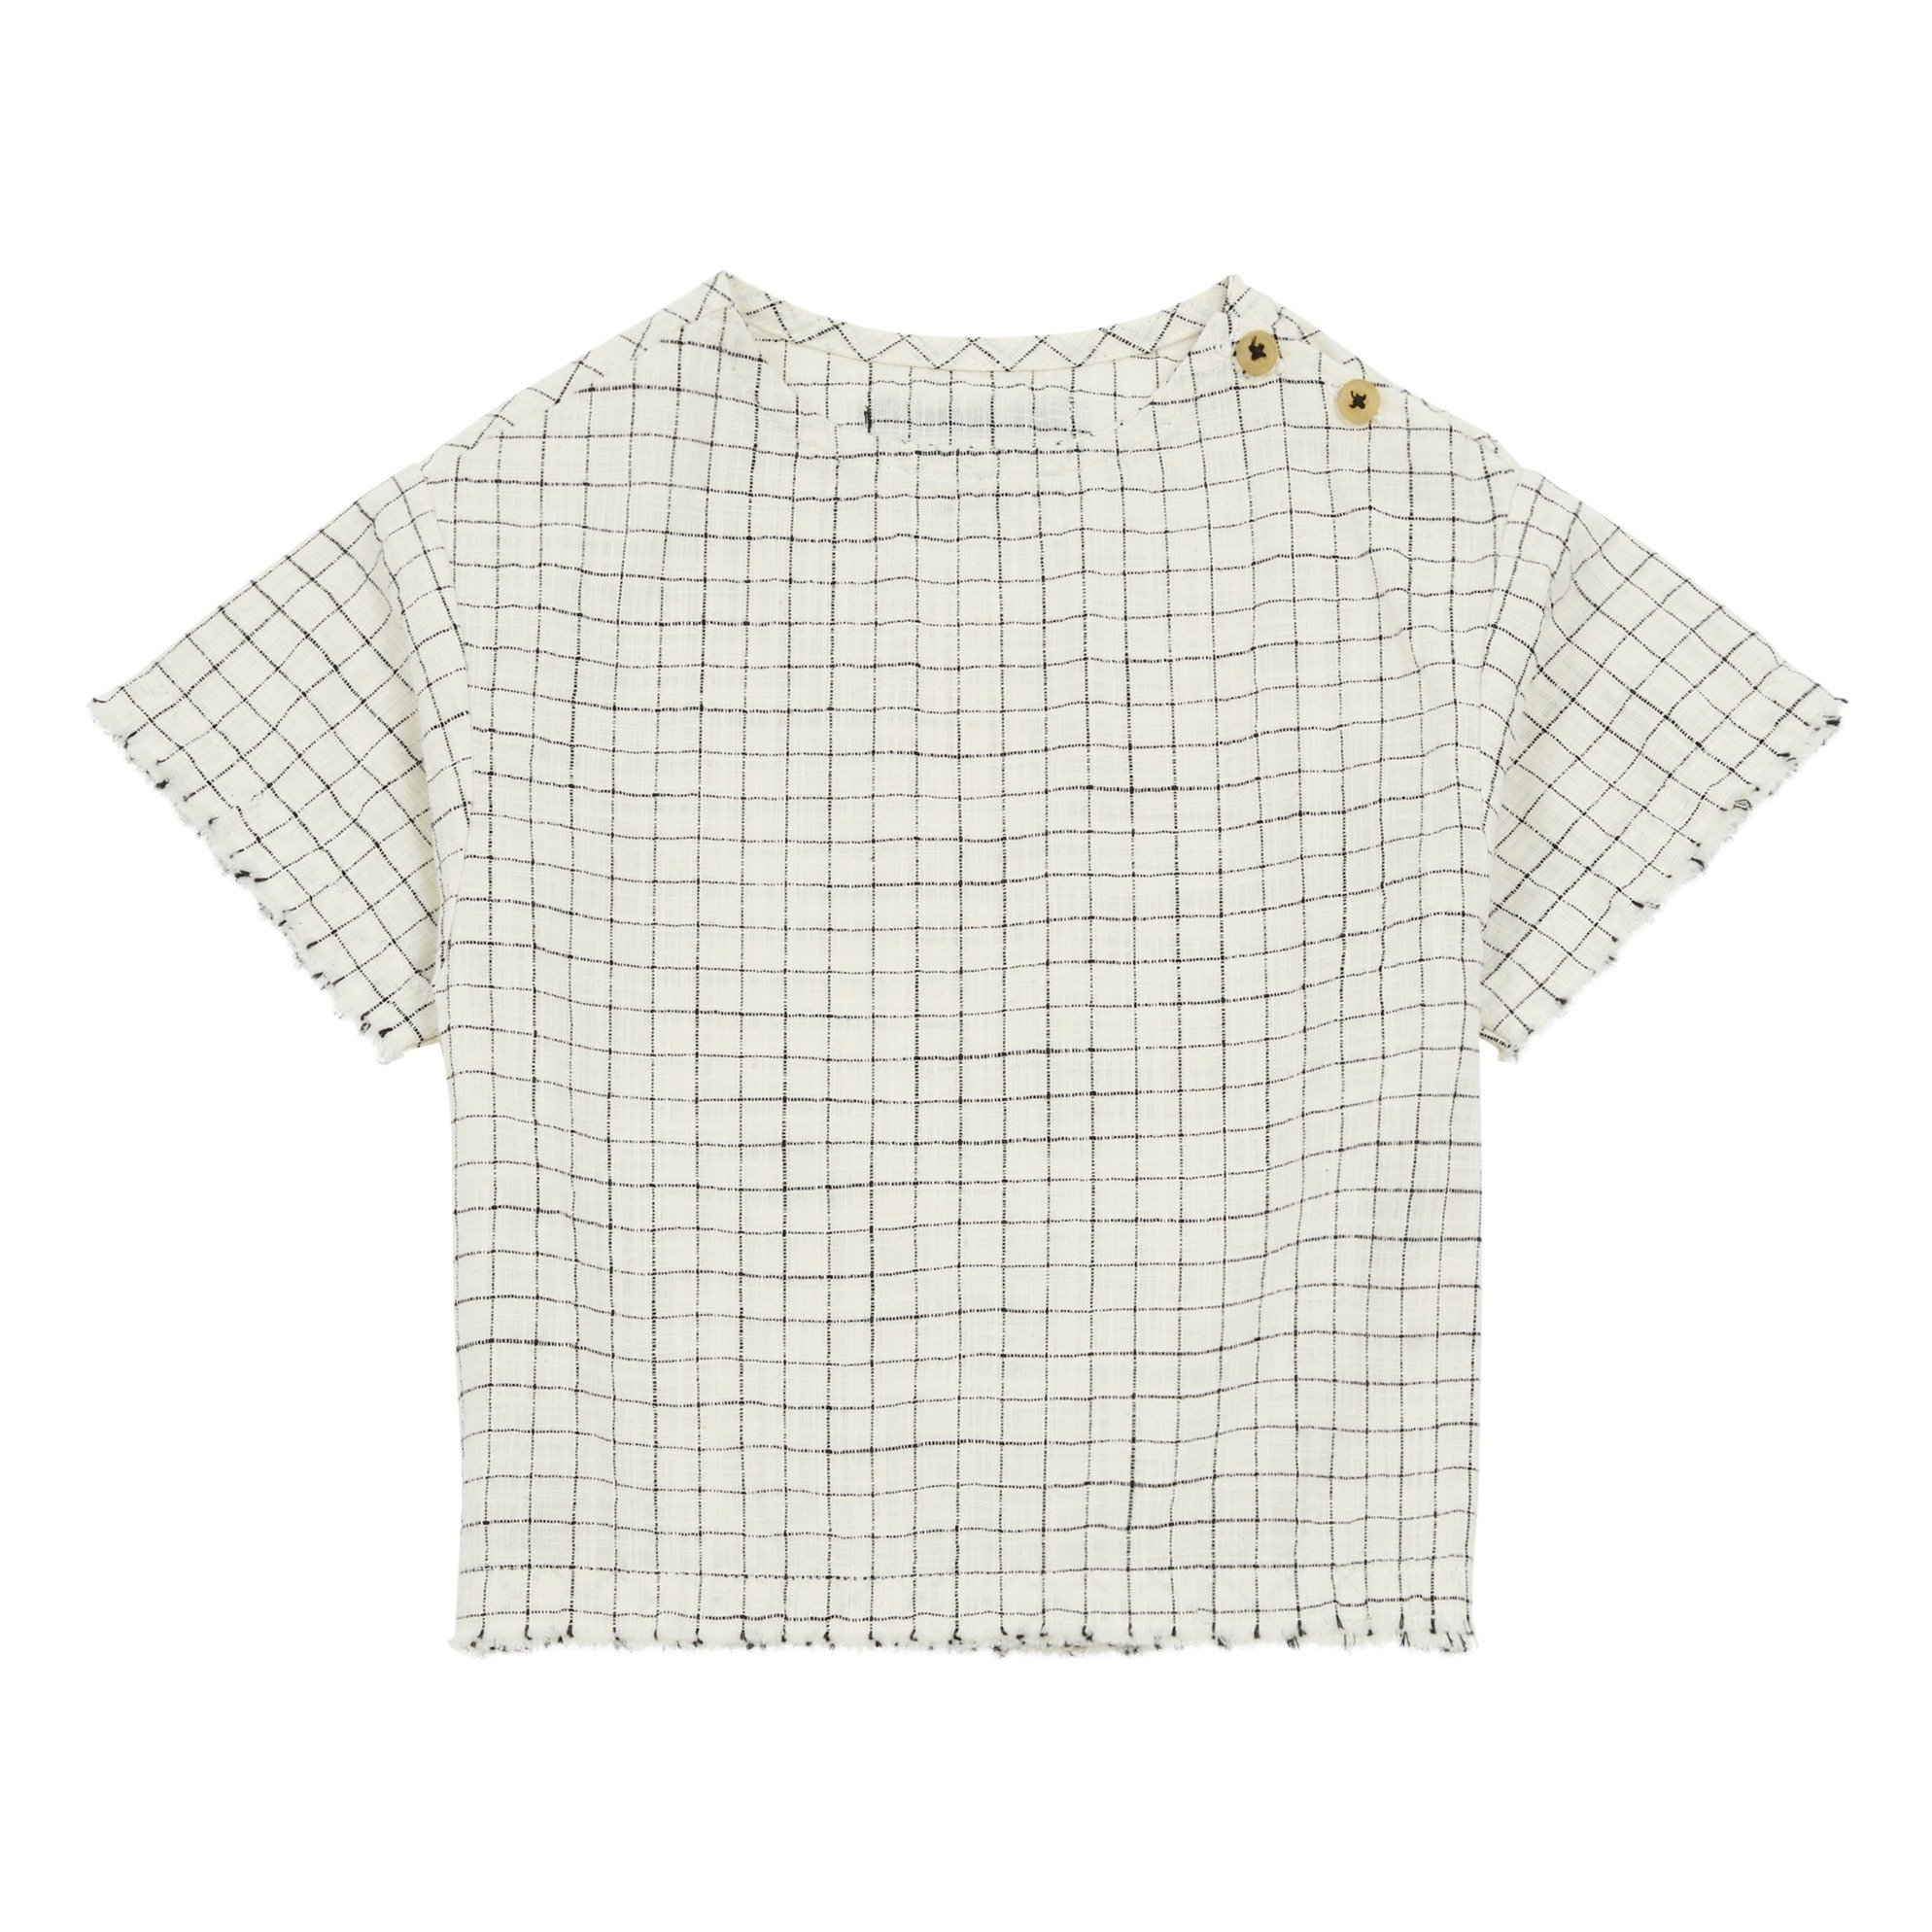 9b36c0b48 Kids Clothing ⋅ Kids Fashion ⋅ Smallable (30)